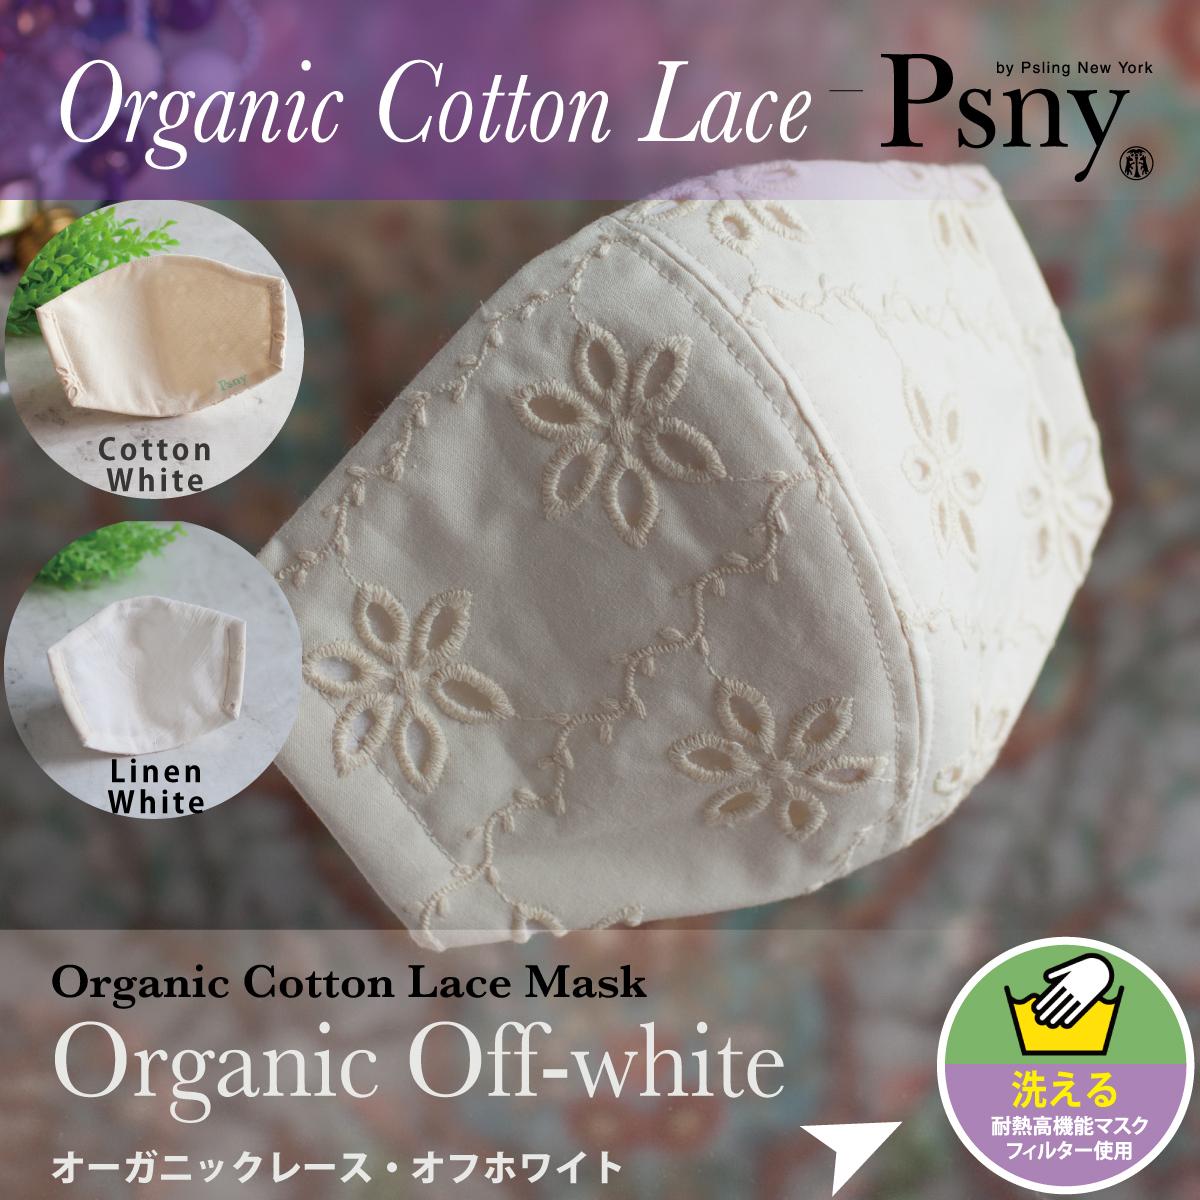 PSNY オーガニックコットン・レース(オフホワイト) 花粉 黄砂 洗えるフィルター入り 立体 マスク 大人用 送料無料